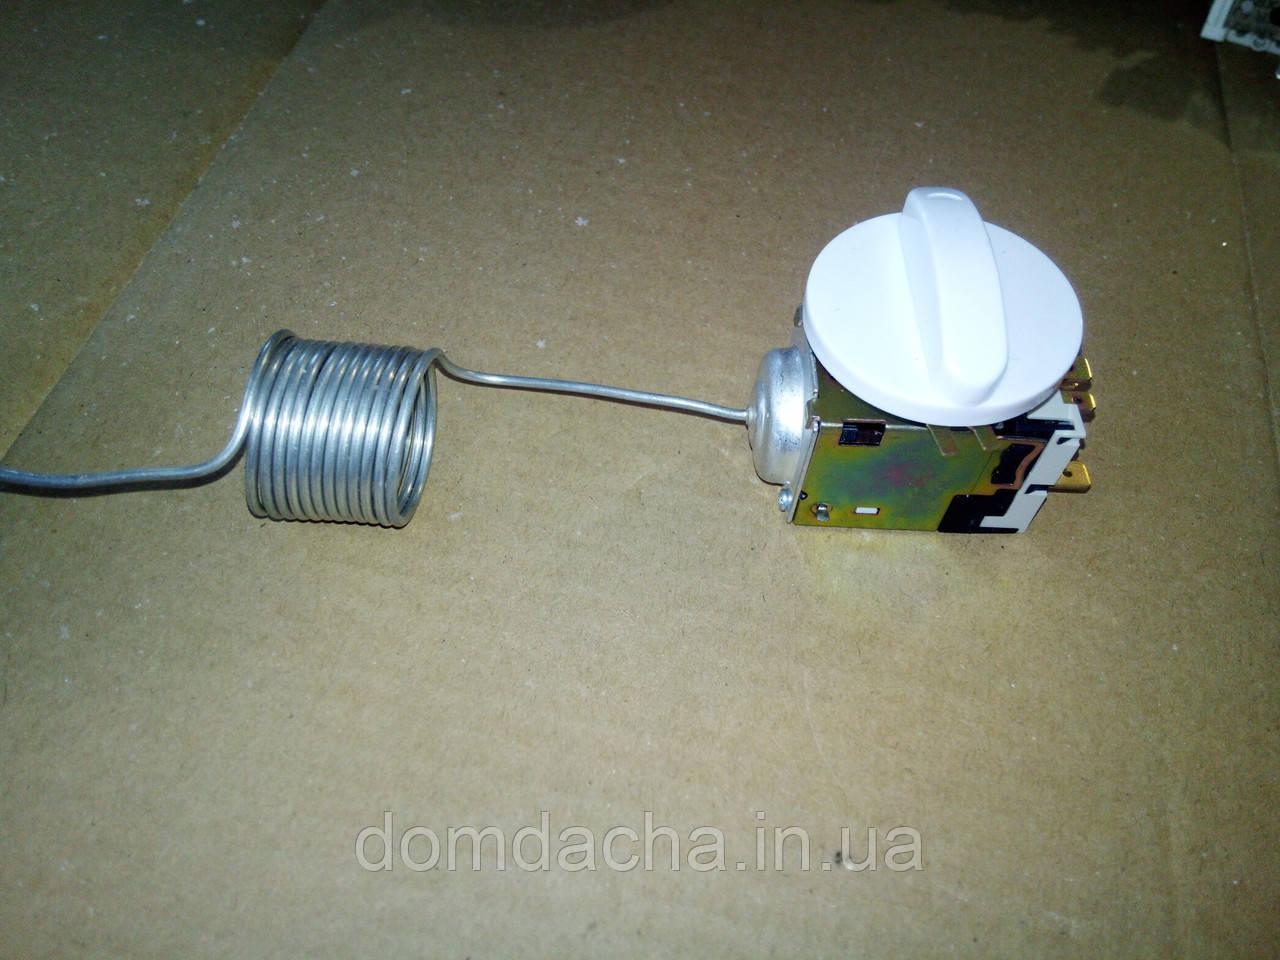 Термостат для холодильника ТАМ-145 1.3 м